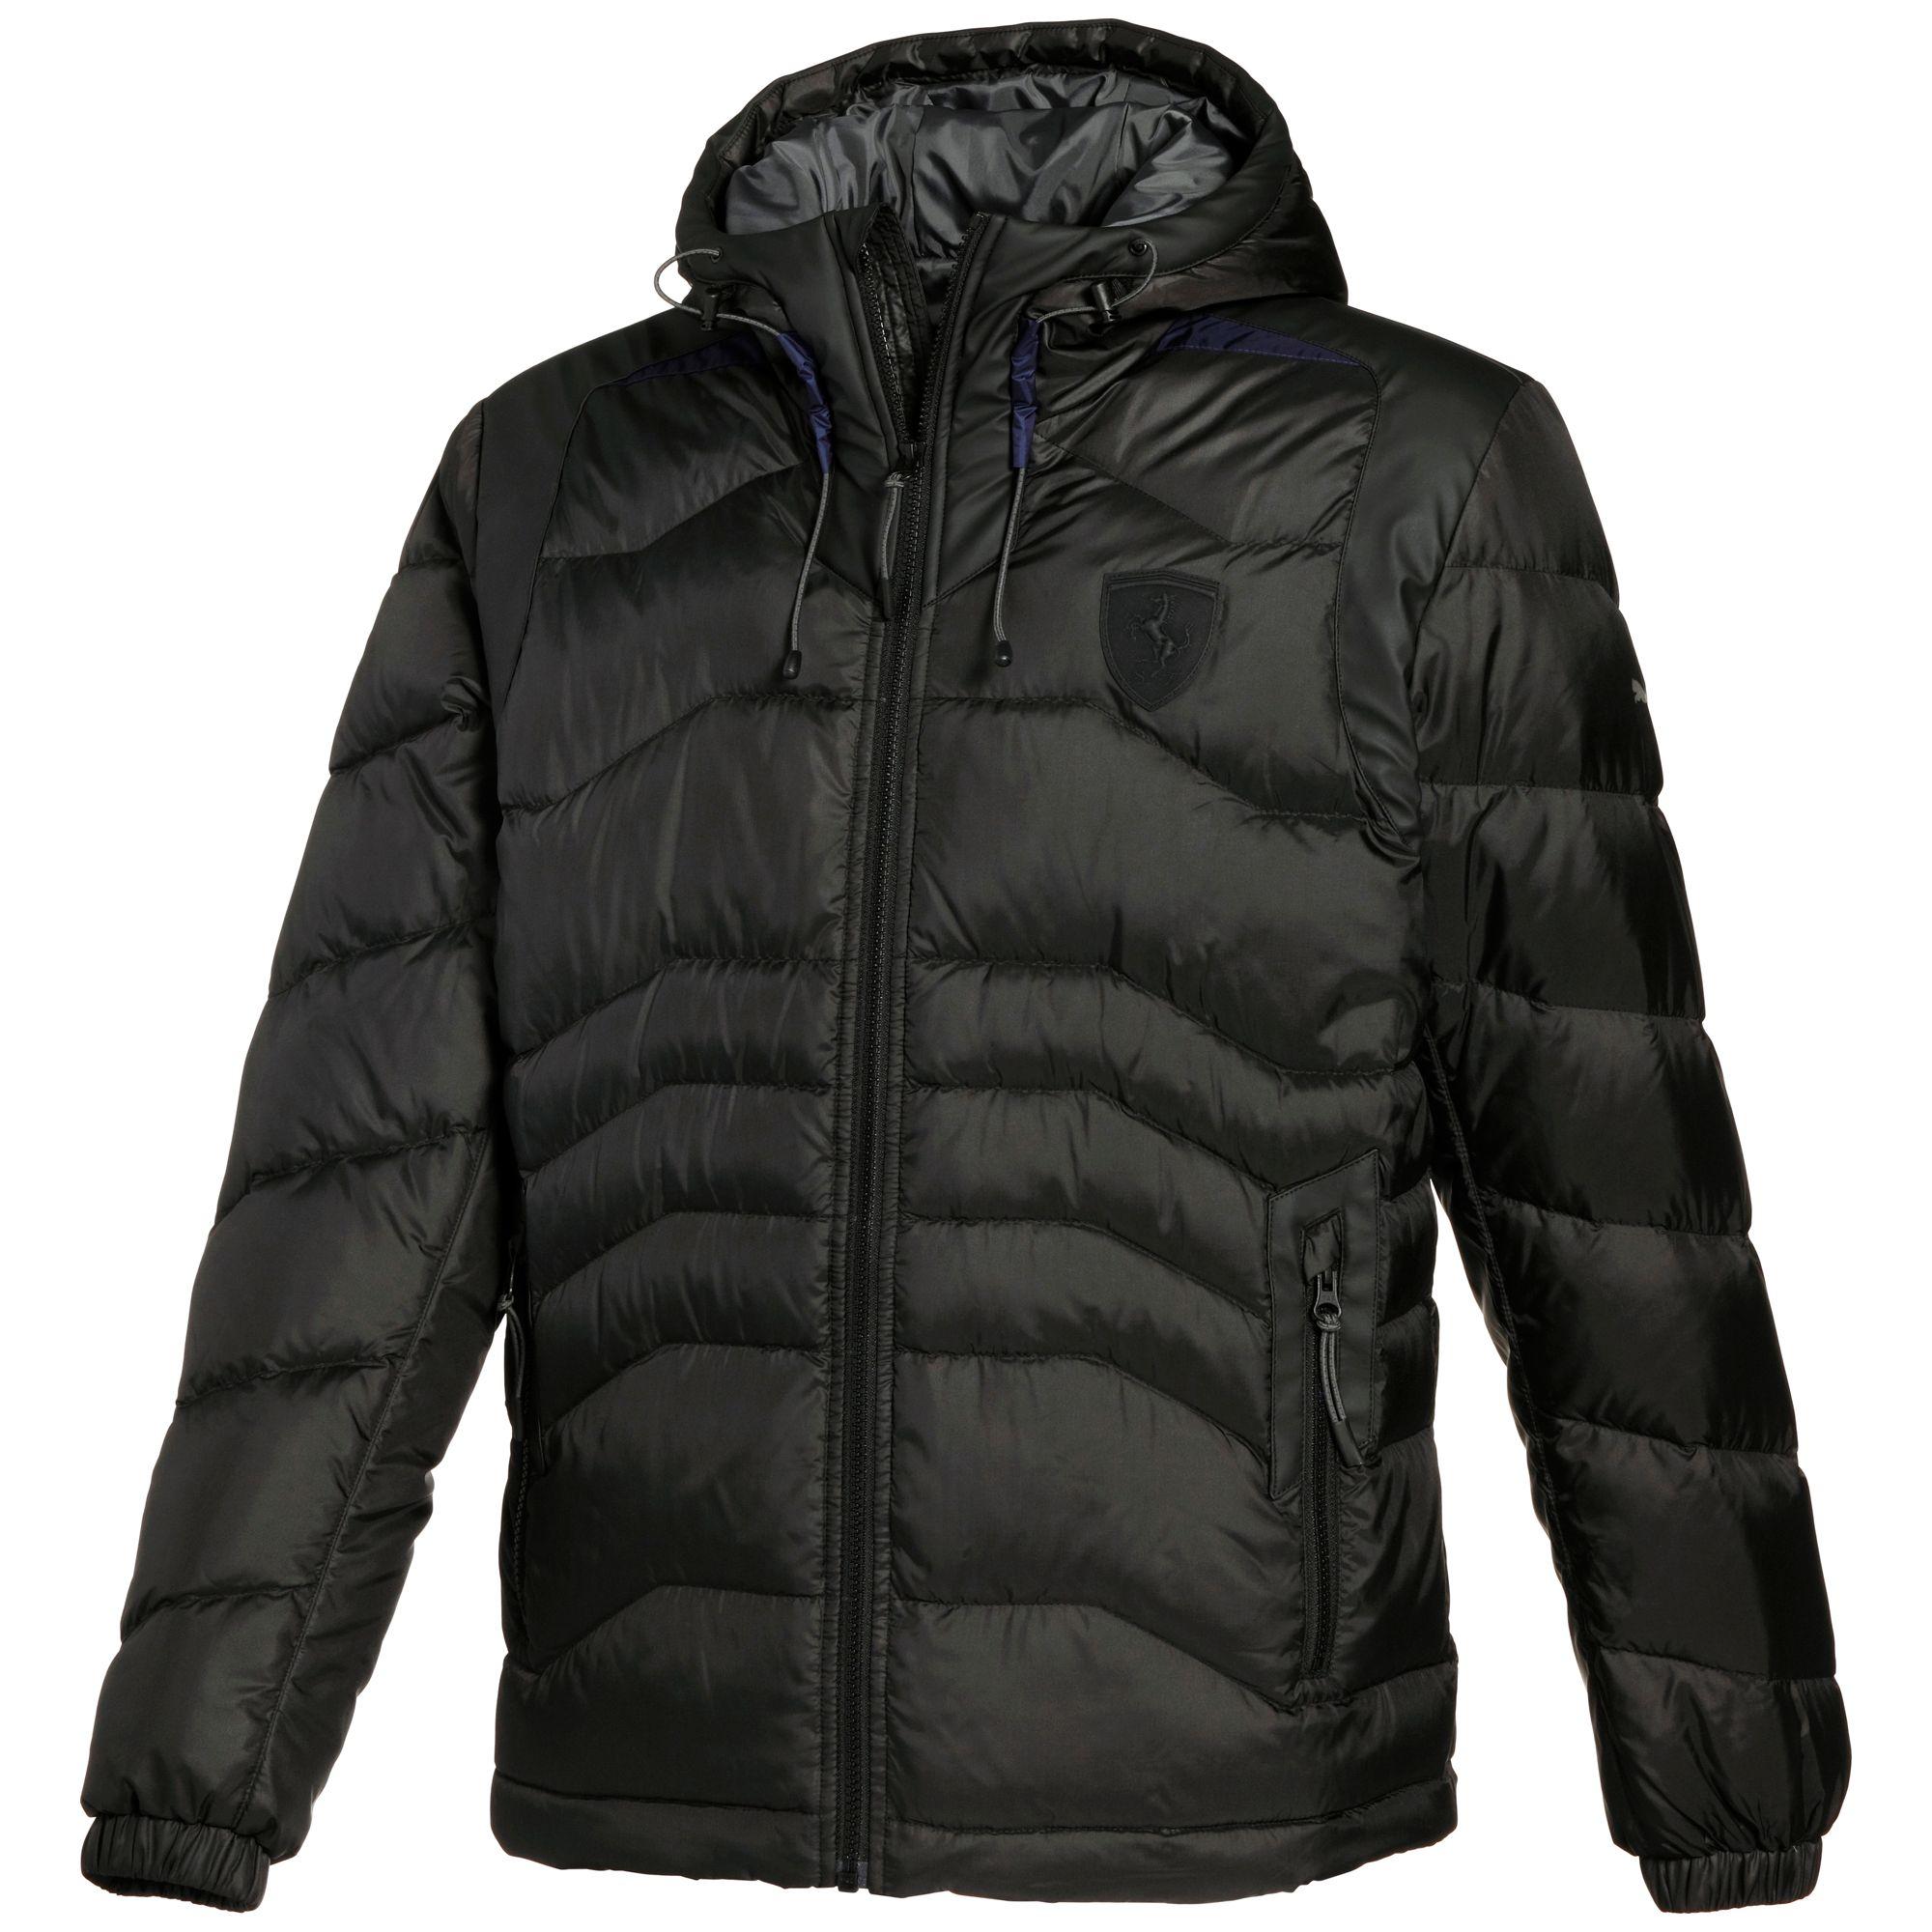 puma ferrari down jacket apparel winter jackets auto men new | ebay